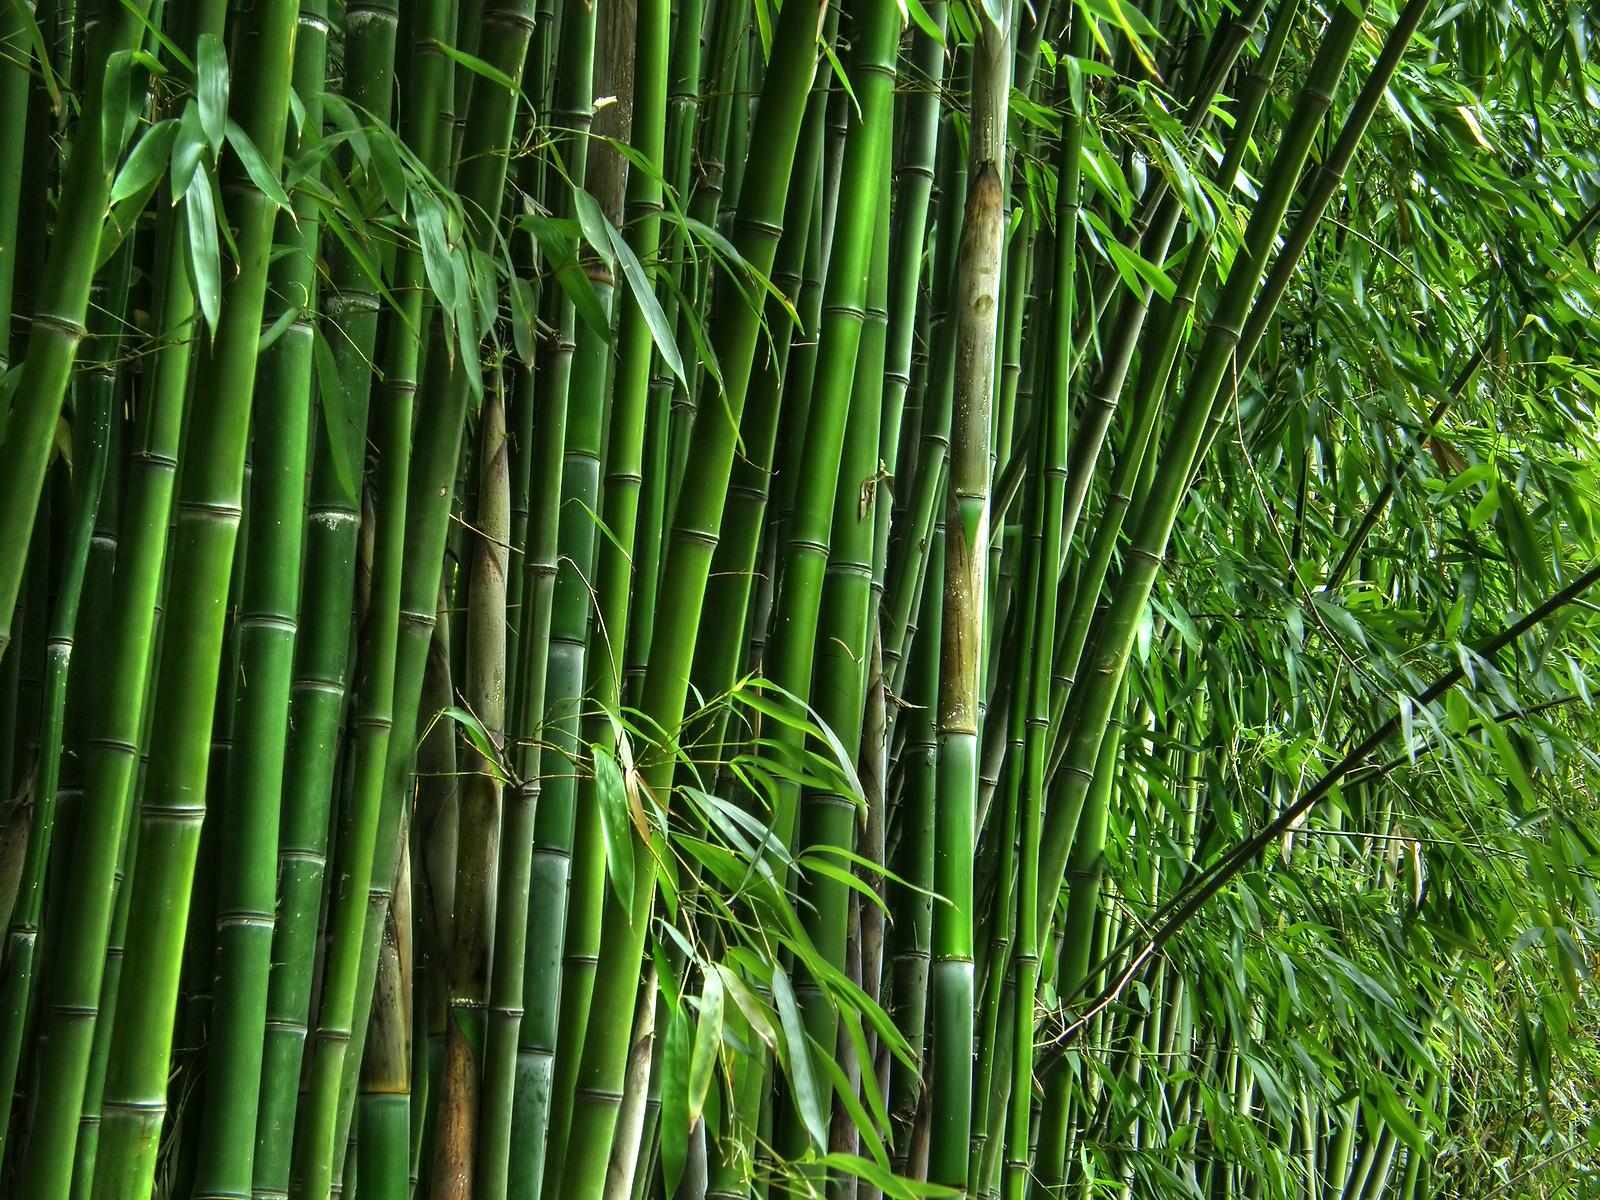 """Tropical Bamboo in the U.S.,"" - AroundWellington.com ..."